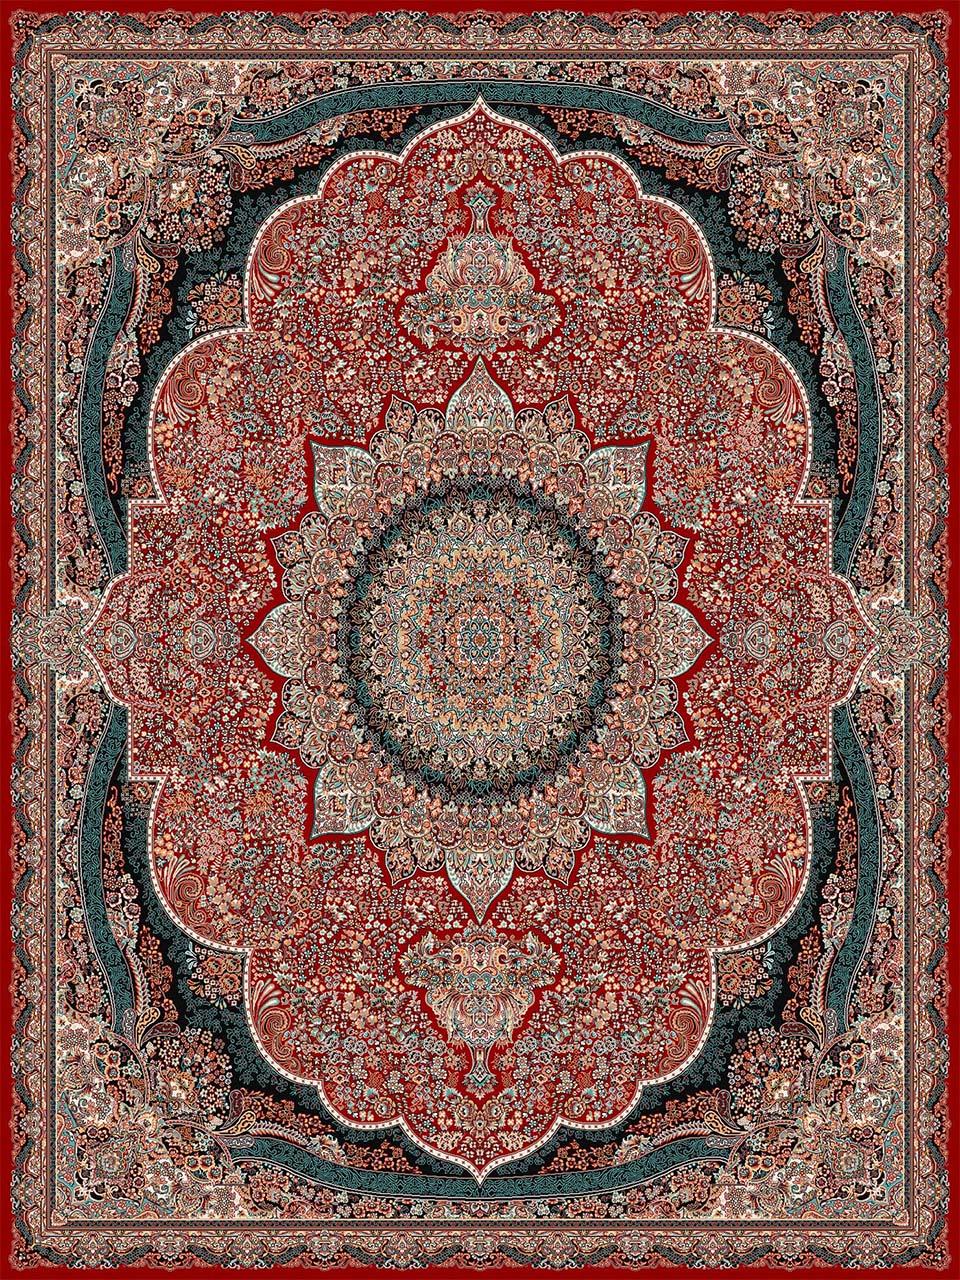 فرش (18133) اکریلیک - 8 رنگ - 500 شانه - لاكي - تراکم 1000